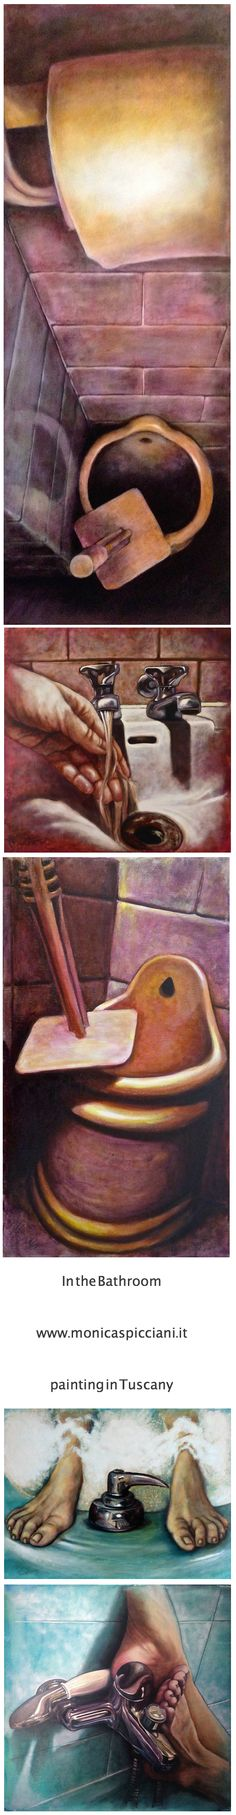 Monica Spicciani #Painter #Painting in #Tuscany #Italy #art #fineart #artist #studio #contemporaryart #portrait #italianpainter    #Painting #contemporaryart #Painter #Italy #art #fineart #artist #studio #oil #figurative